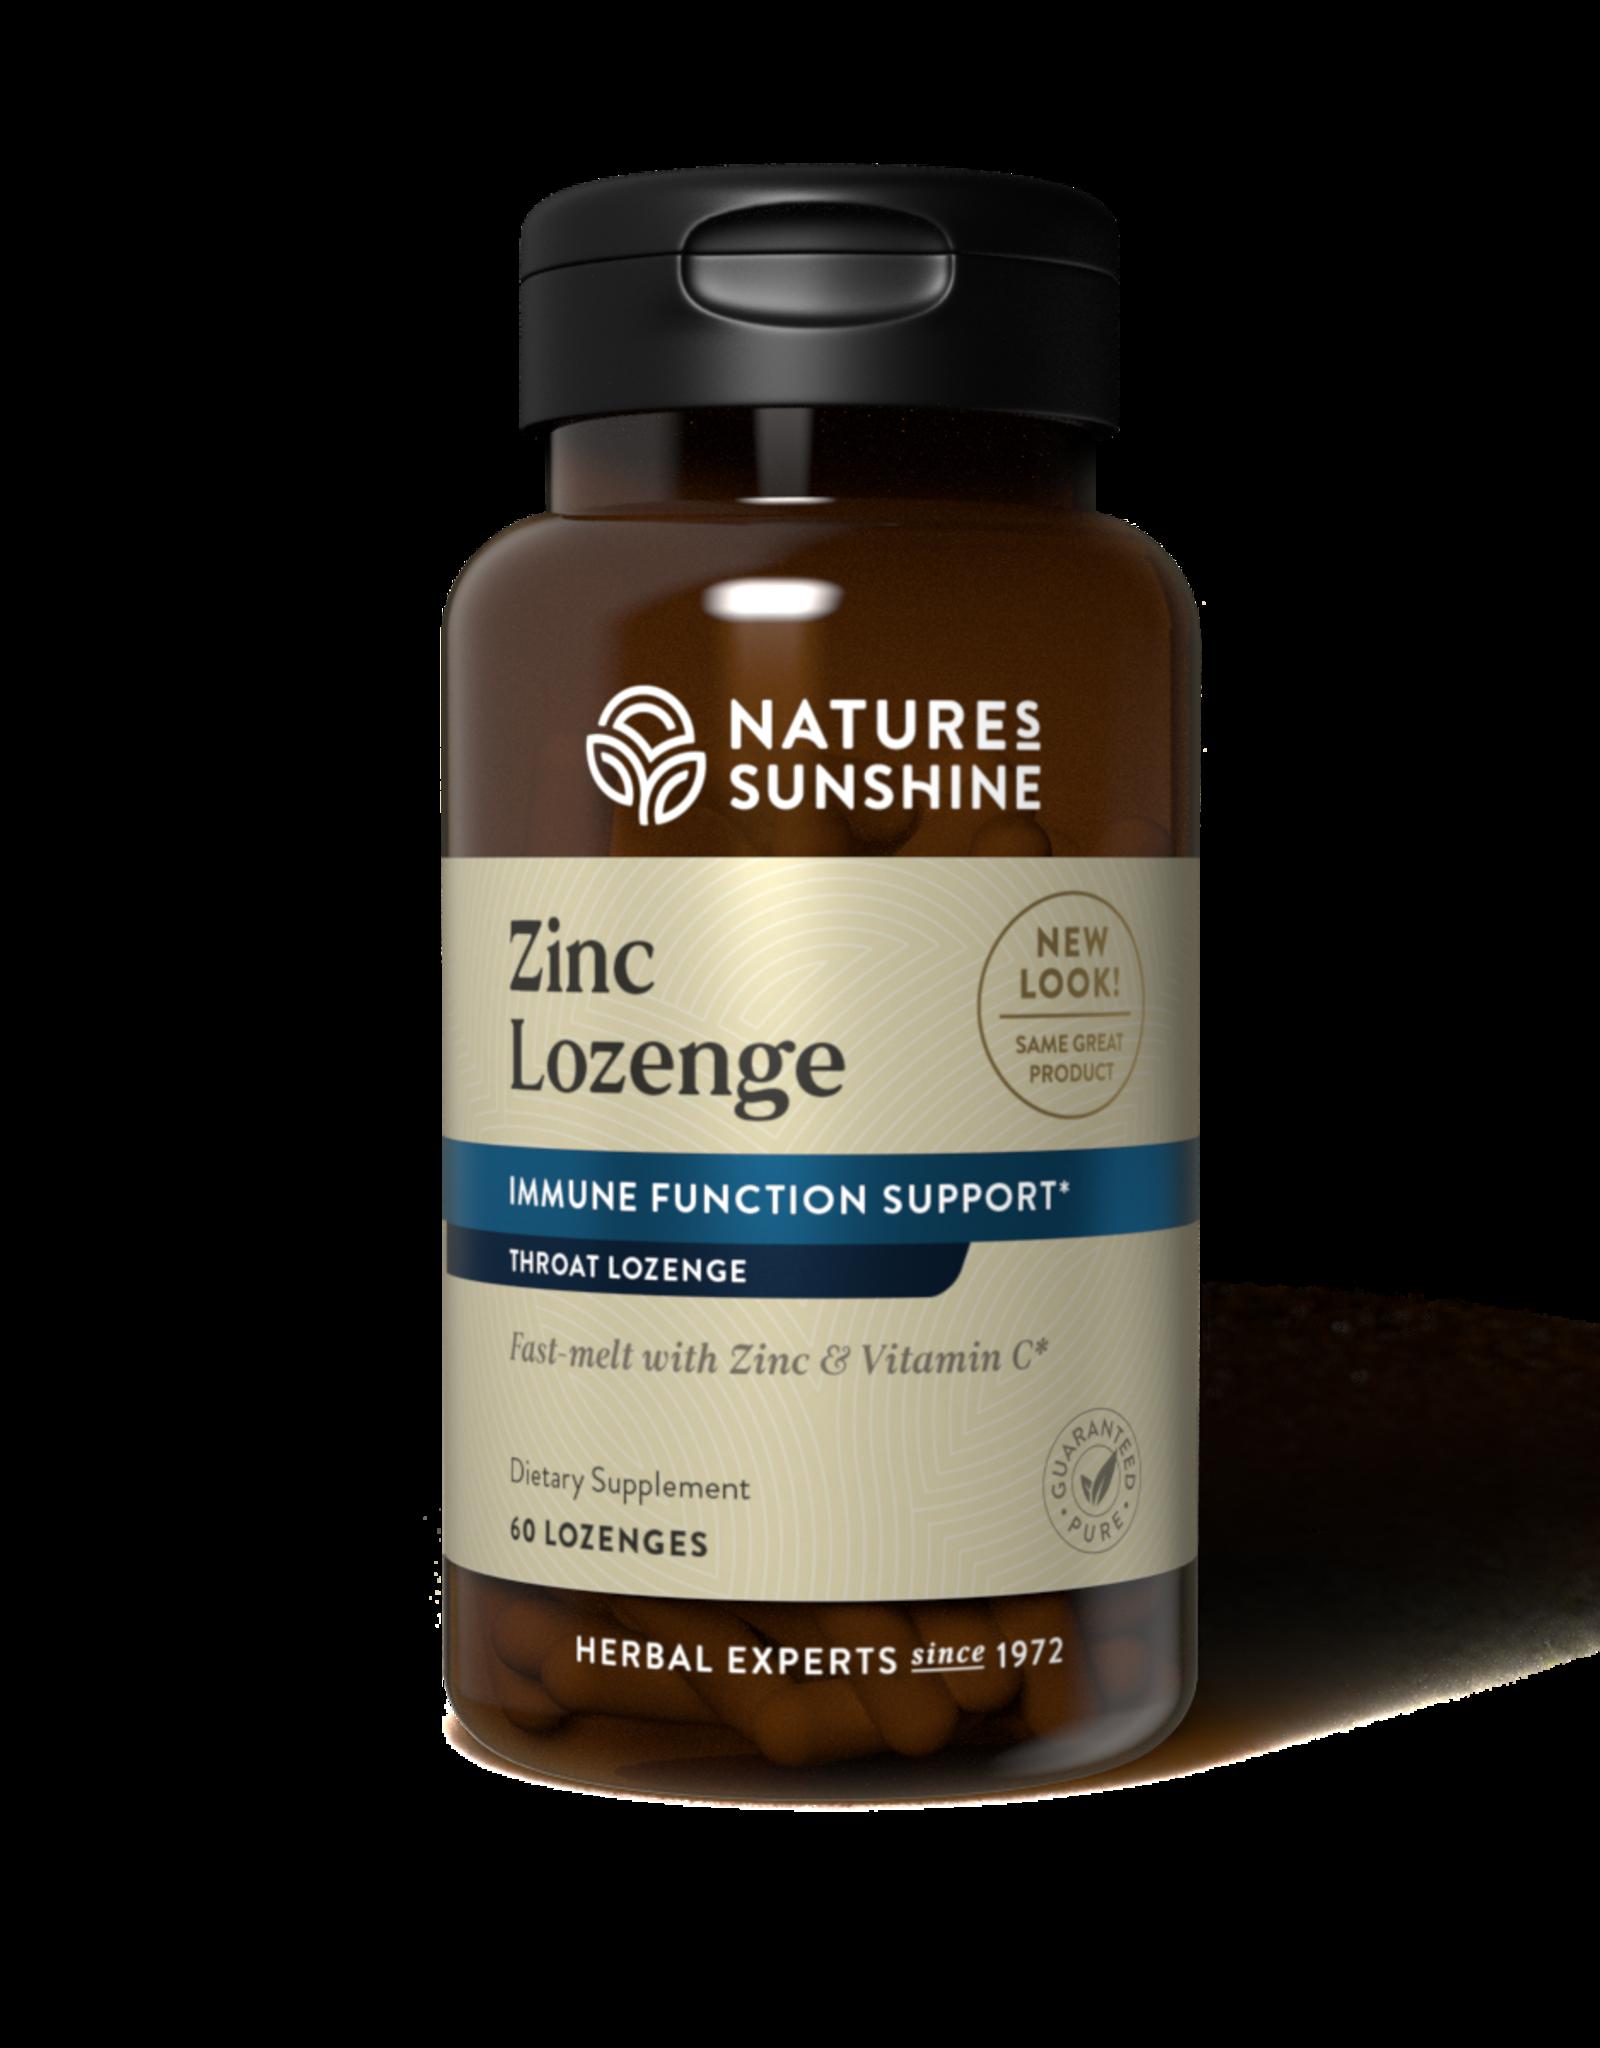 Nature's Sunshine Zinc Lozenge (60 tablets)*